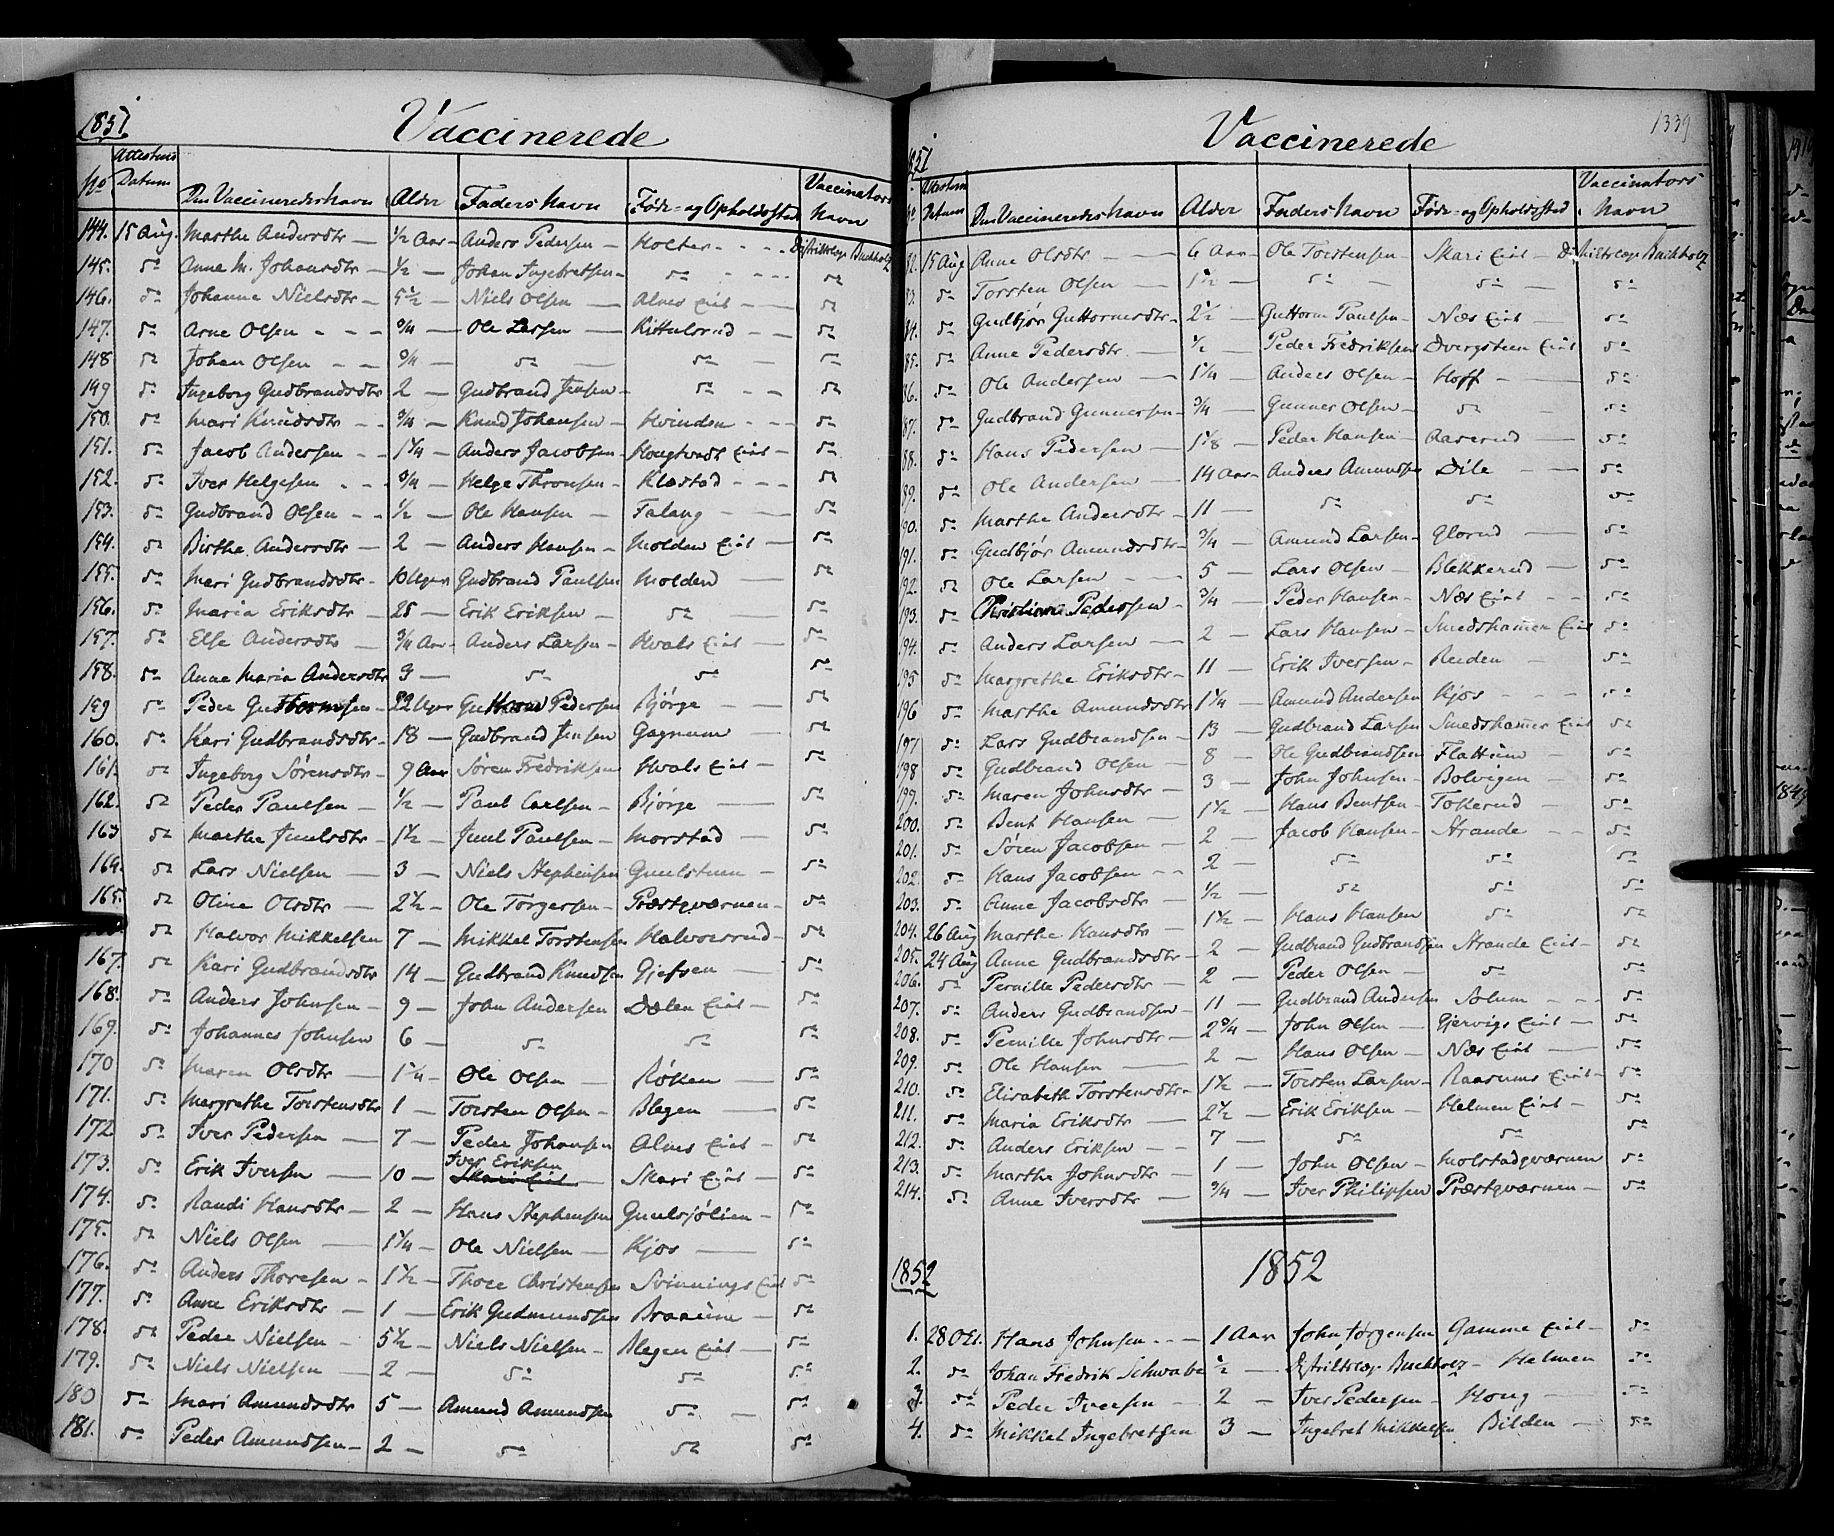 SAH, Gran prestekontor, Ministerialbok nr. 11, 1842-1856, s. 1338-1339